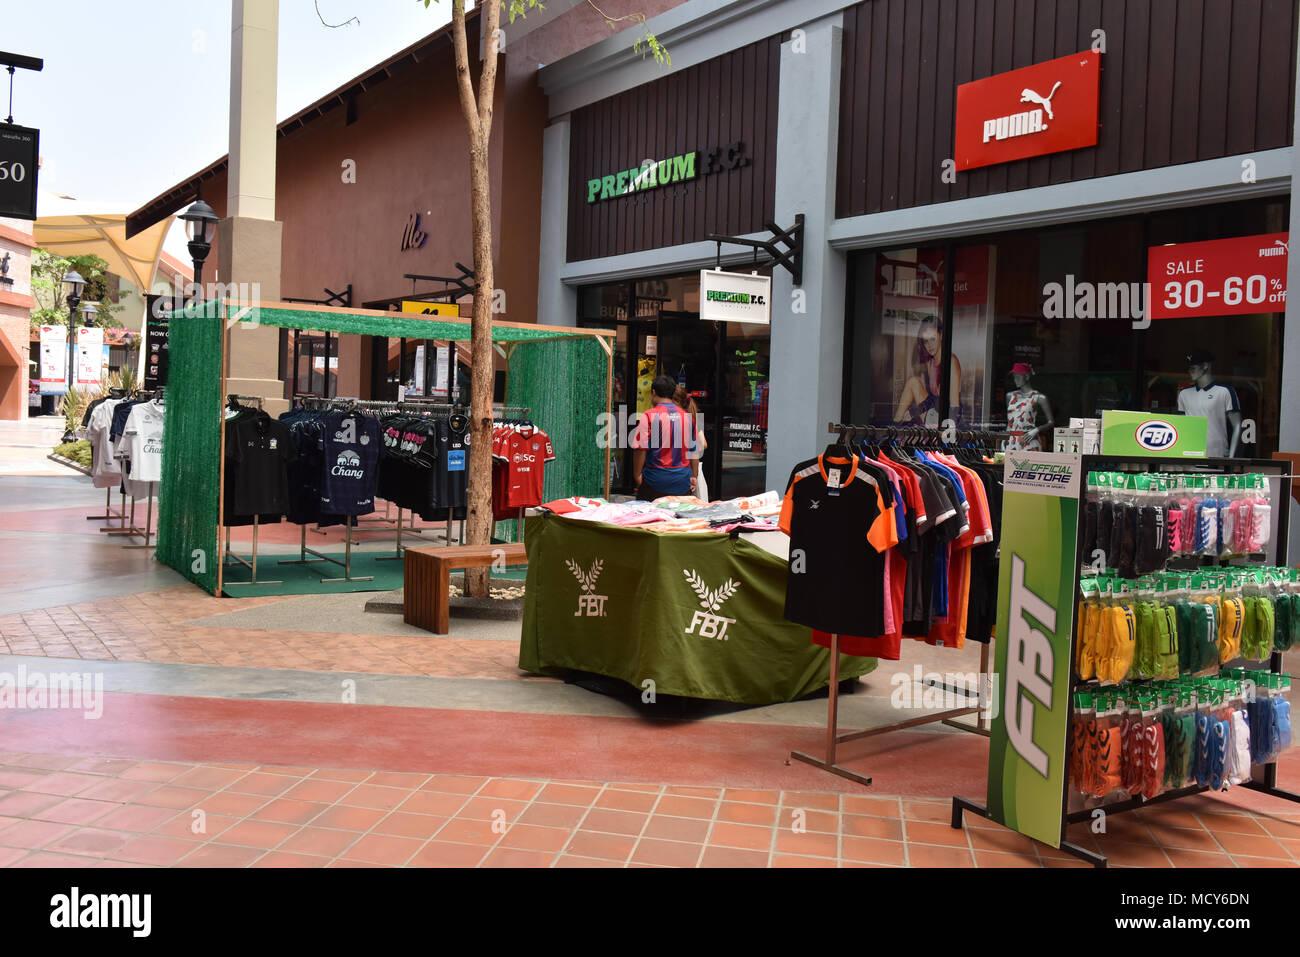 8b446bbdd16 Kad Farrang Village Shopping Mall Stock Photo: 180077345 - Alamy